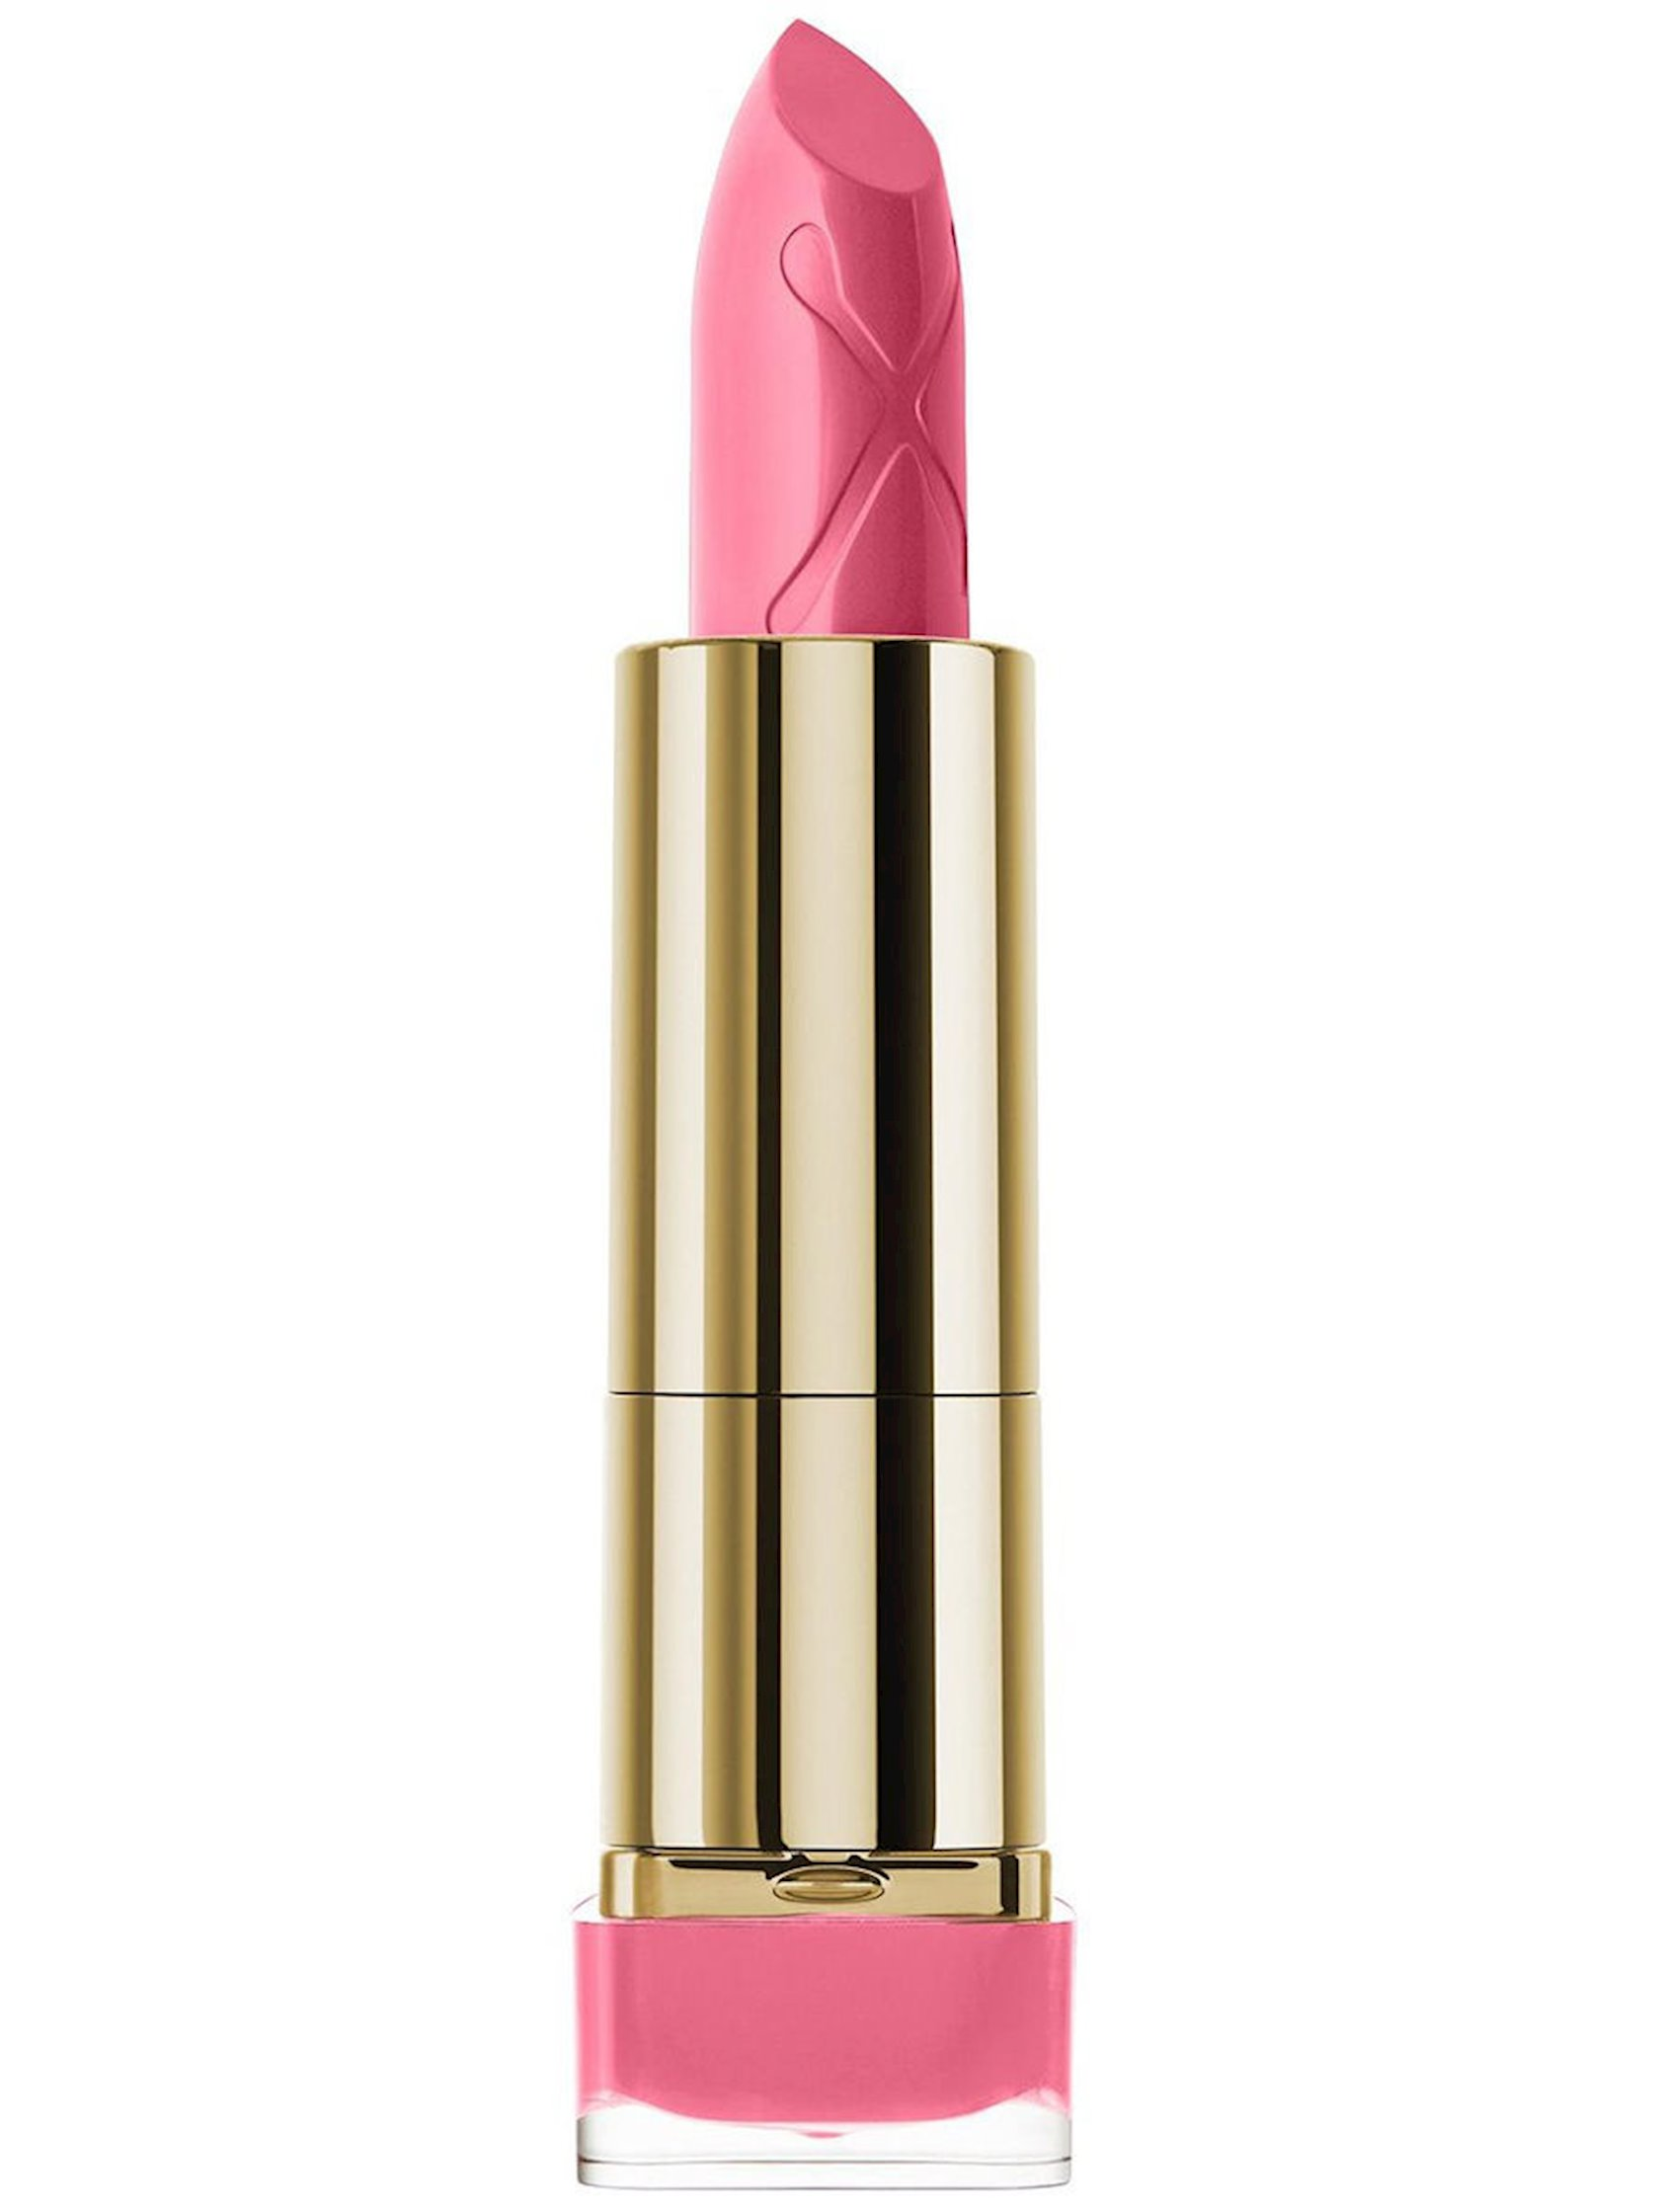 Dodaq pomadası Max Factor Colour Elixir Lipstick 090 Englsih Rose 4.8 q